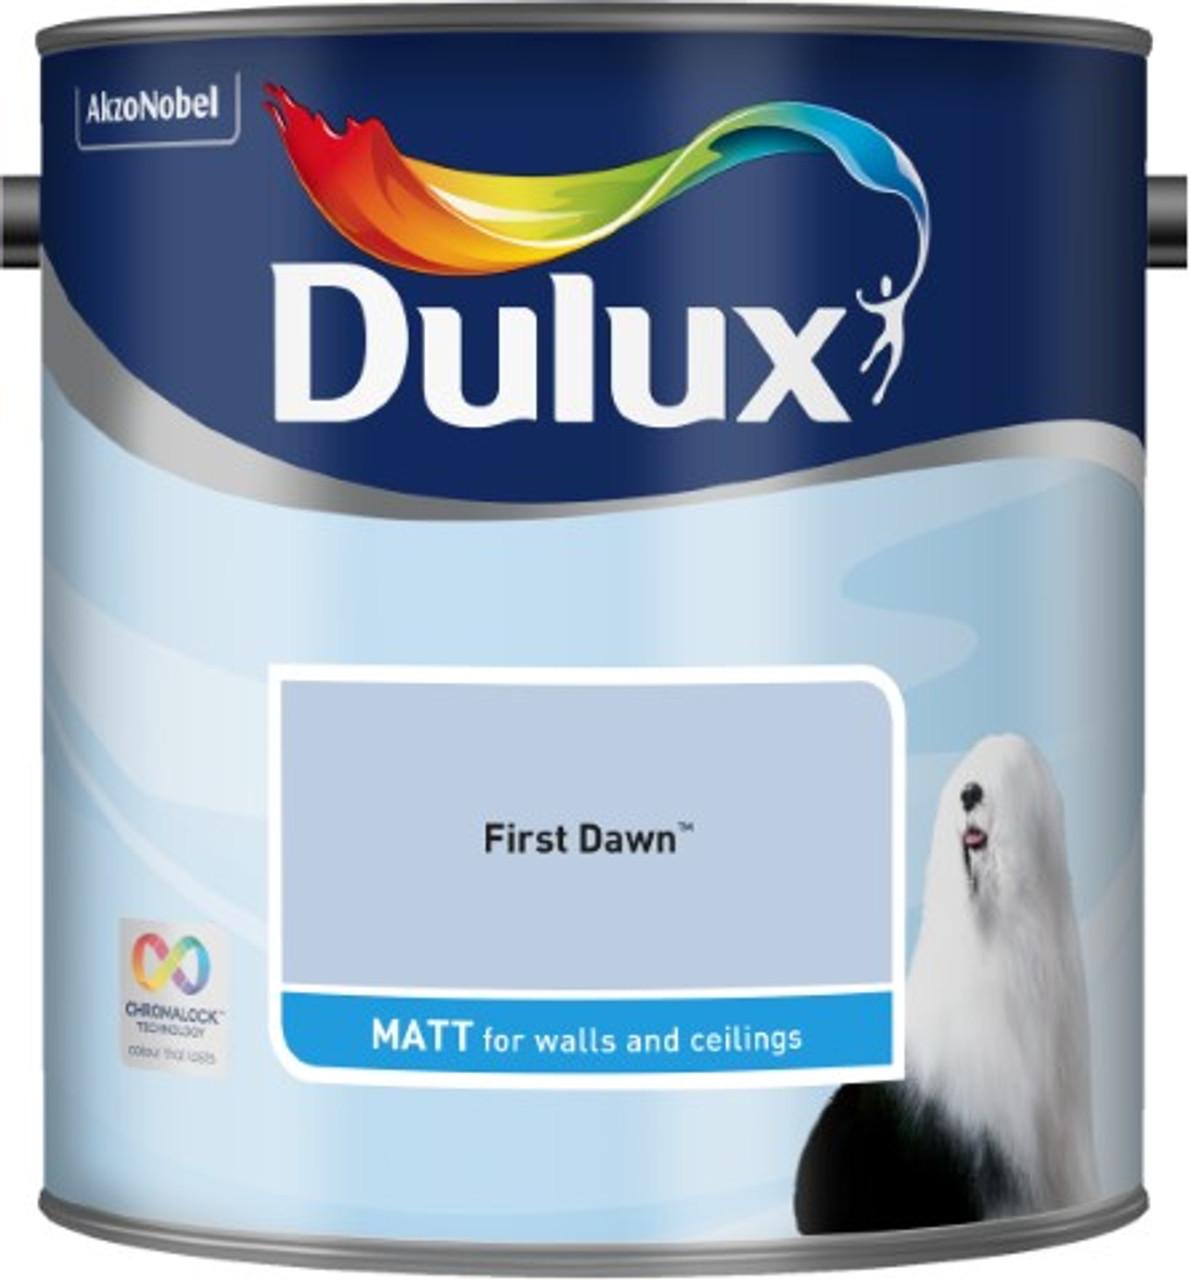 2.5L Dulux Matt Emulsion First Dawn